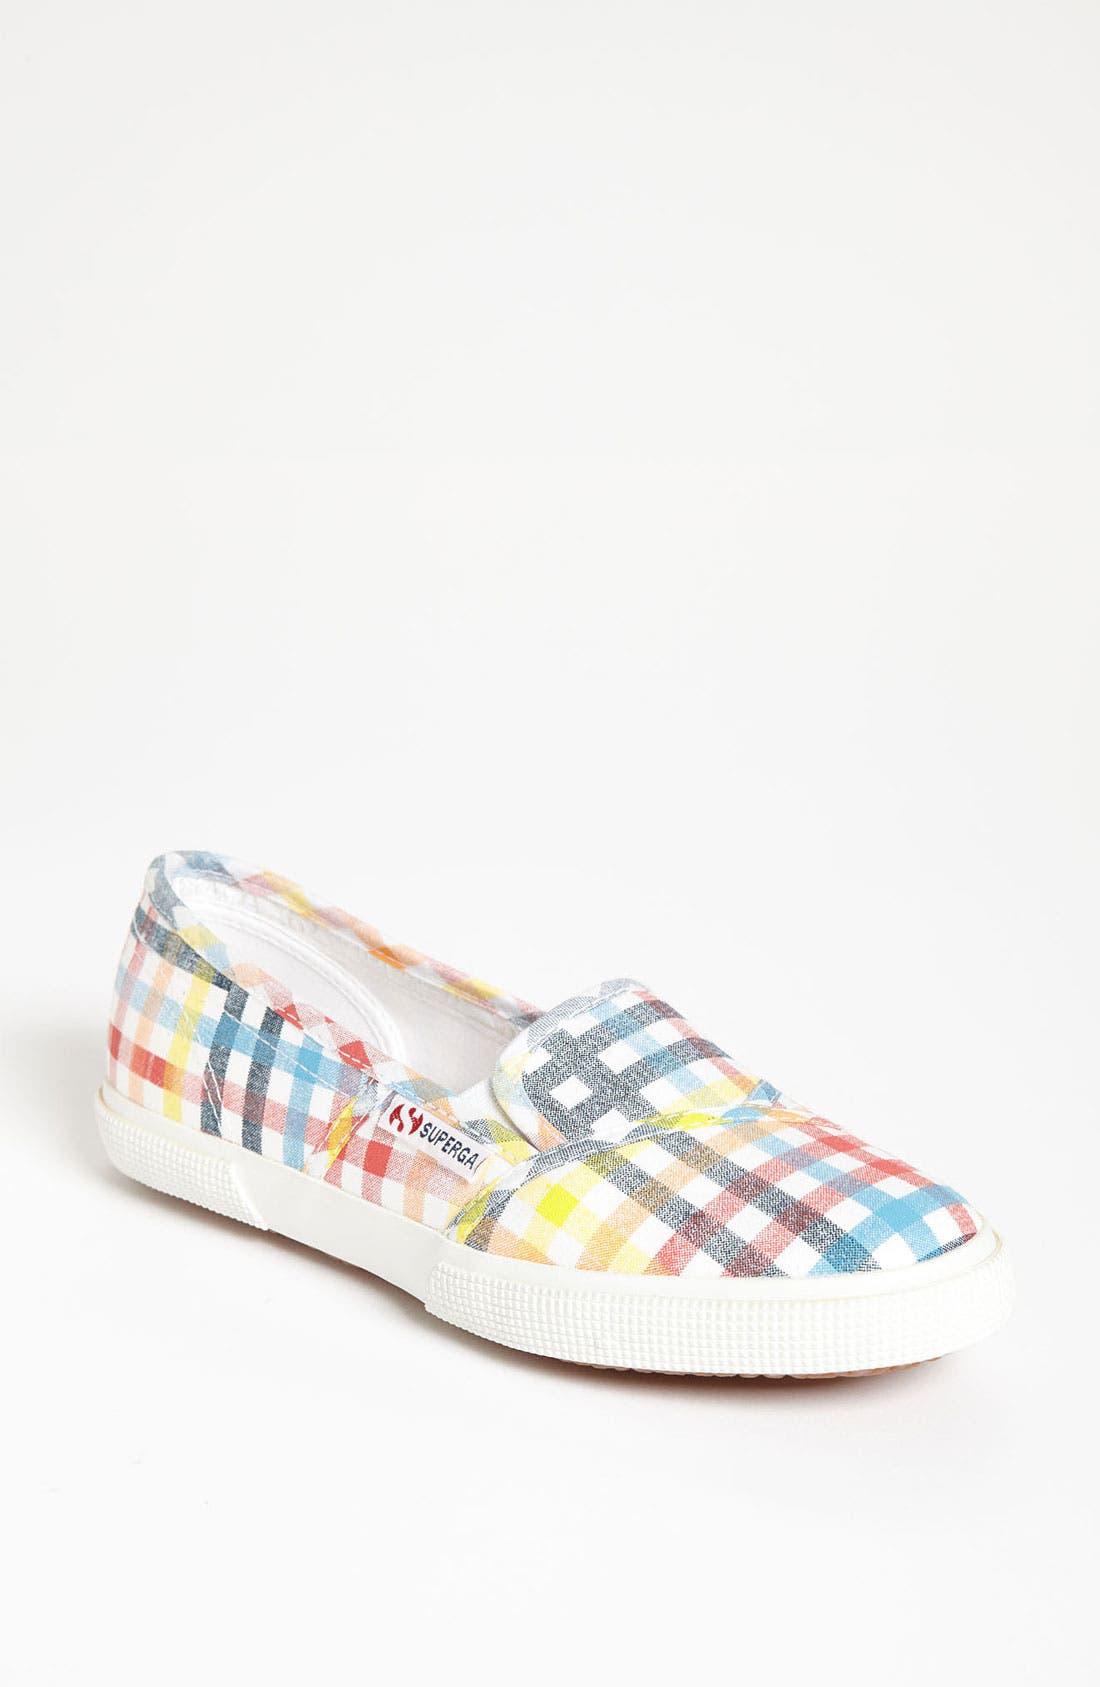 Main Image - Superga 'A Line' Sneaker (Women)